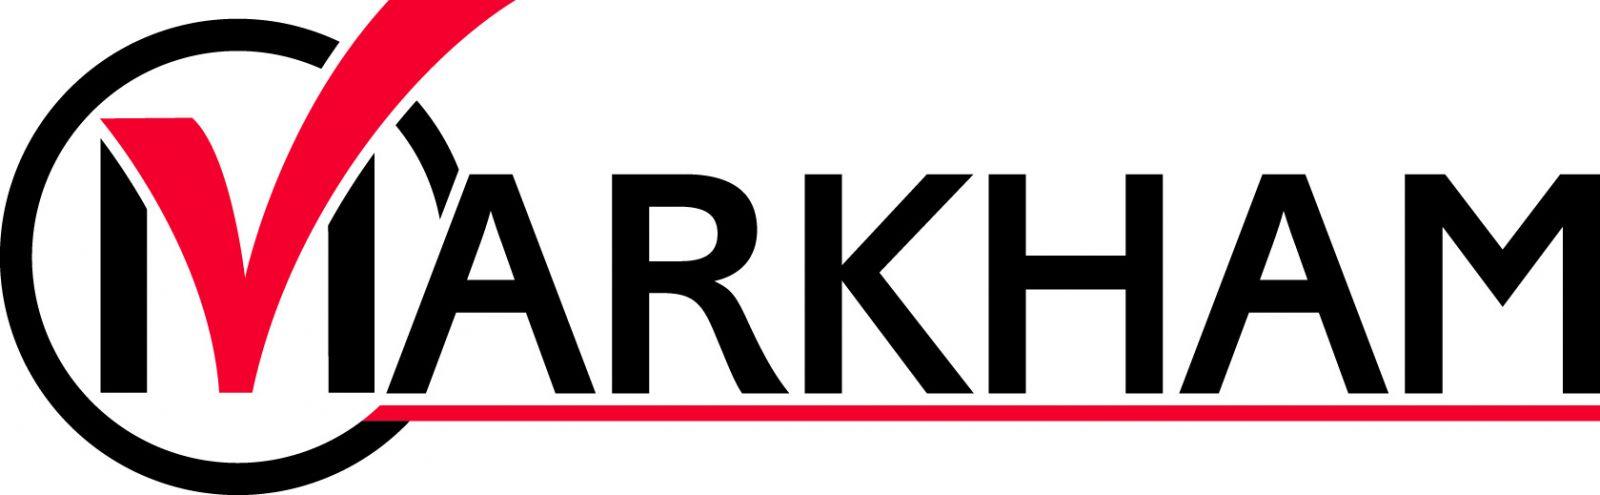 City-of-Markham-Logo logo